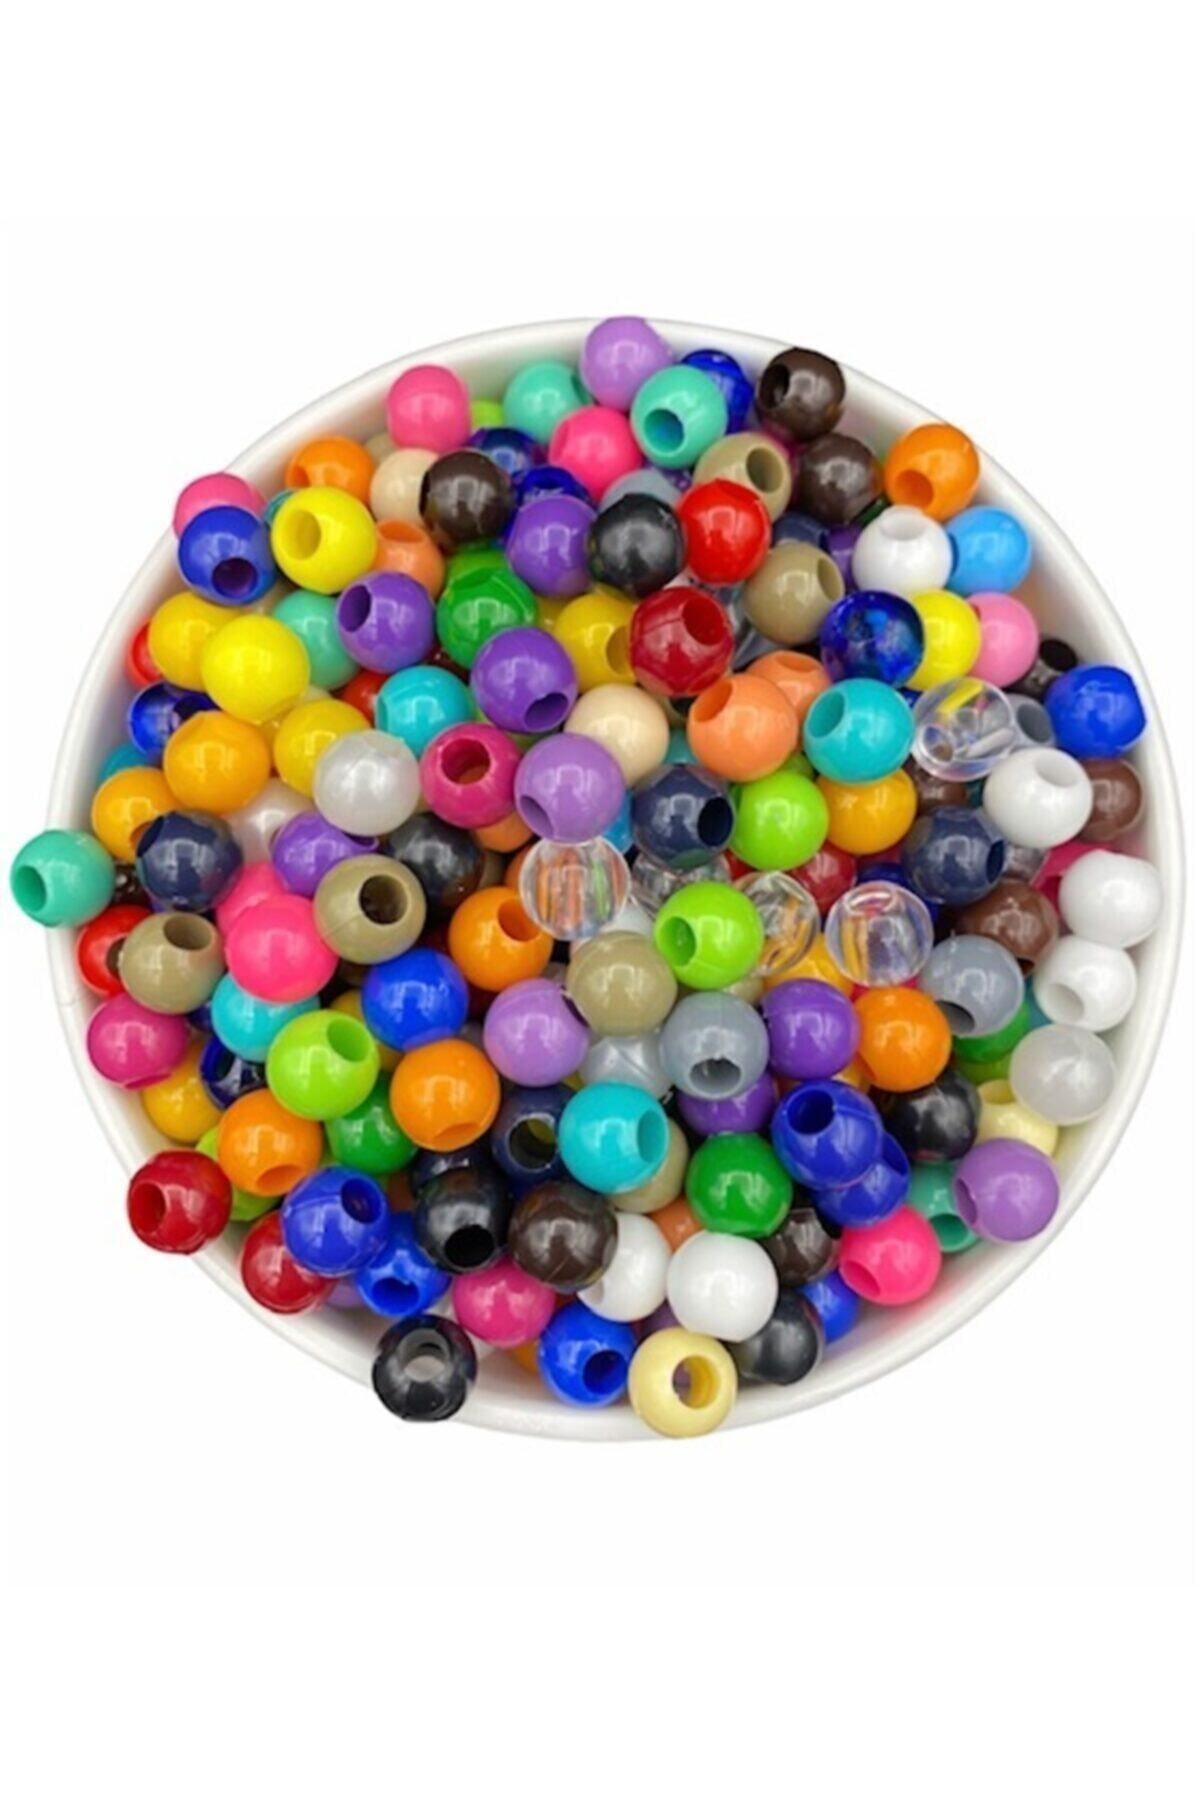 Hedef Bijuteri 10mm Karışık Renkli Plastik Boncuk,renkli Geniş Delik Makrome Boncuğu (100gr,~200 Adet Boncuk) 1